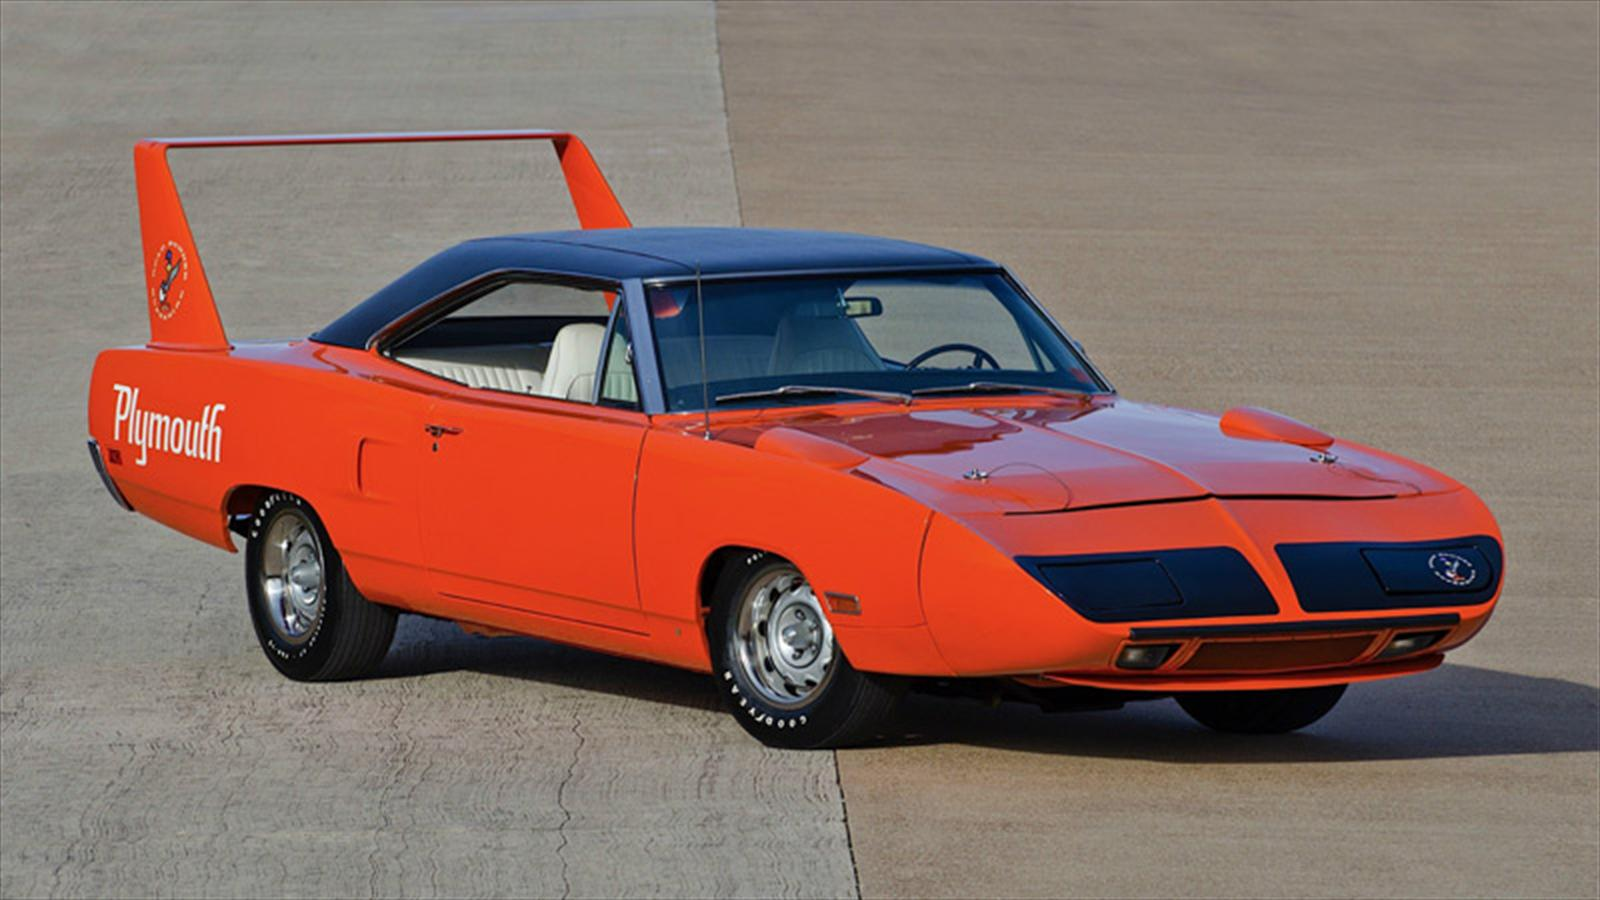 Top 10: Plymouth Roadrunner Superbird 1970 - Autocosmos.com